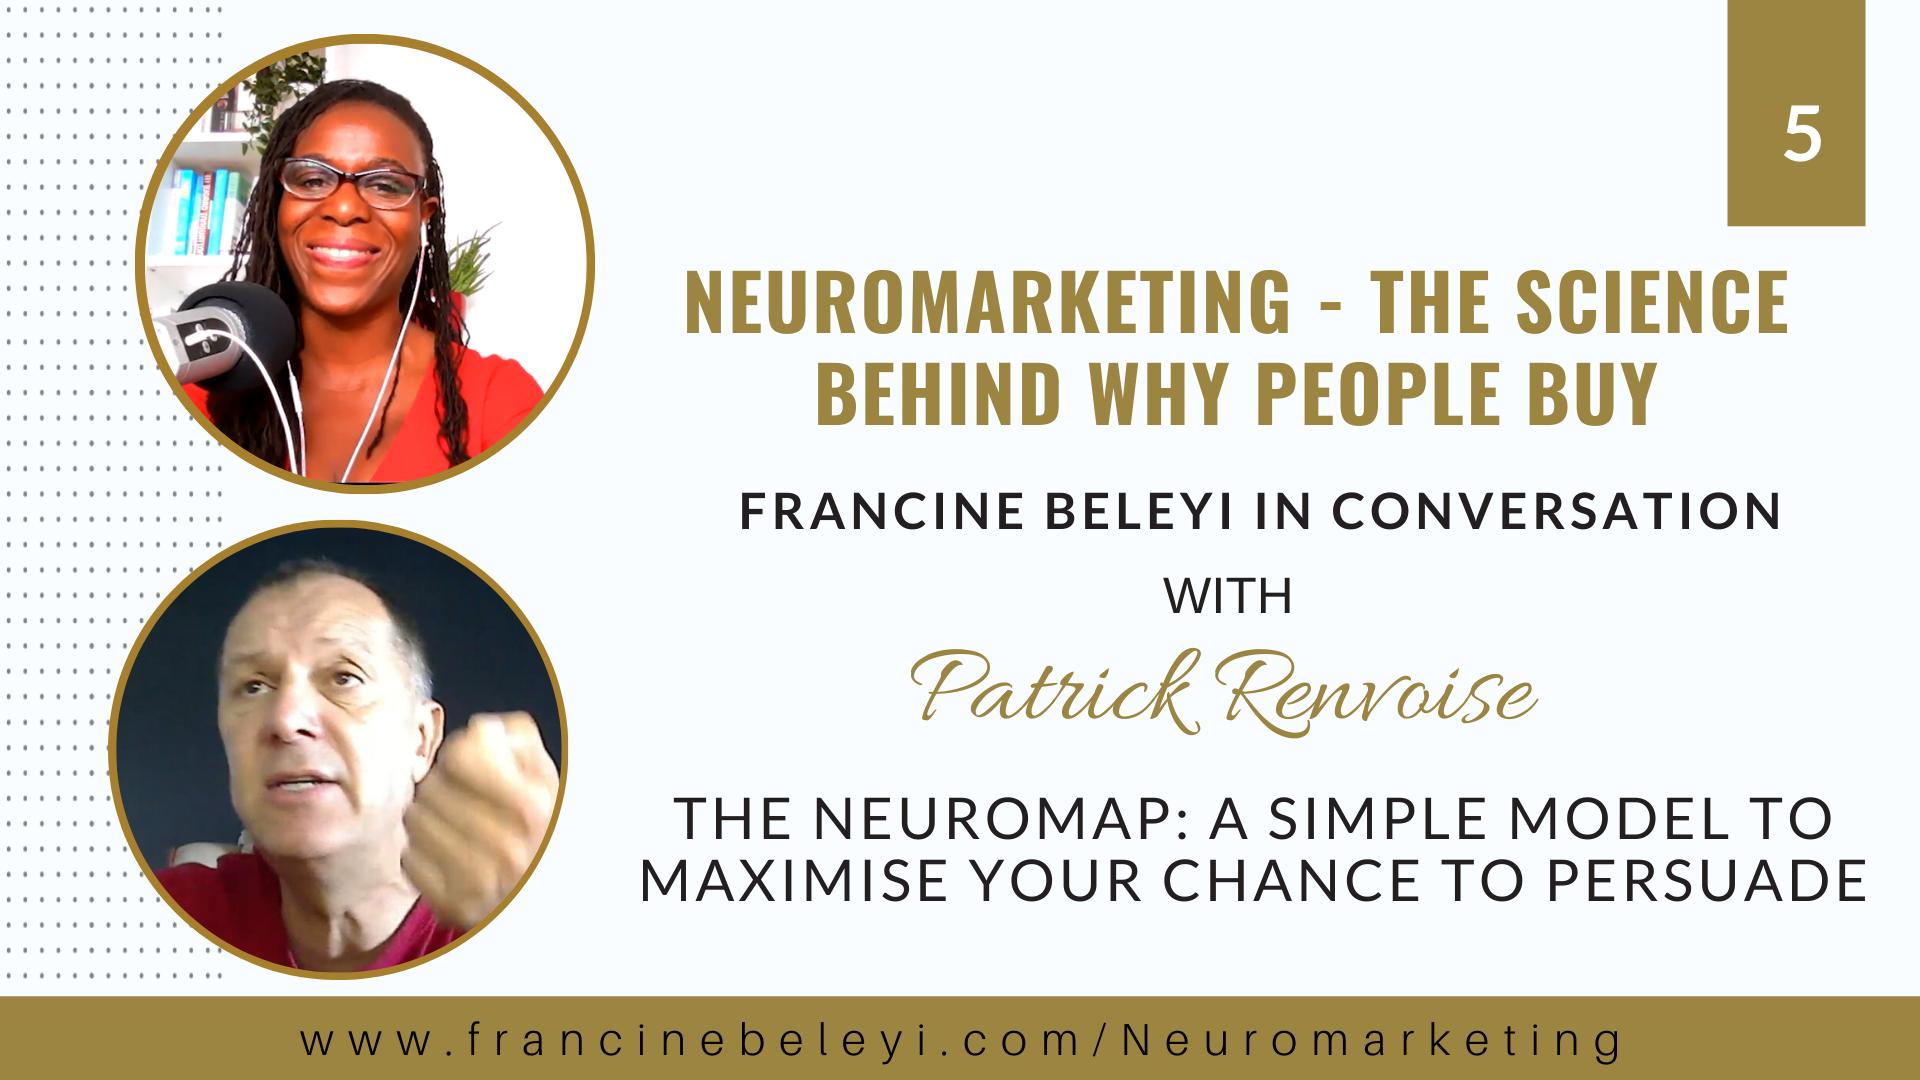 Neuromarketing Patrick Renvoise - Francine Beleyi - persuasion code